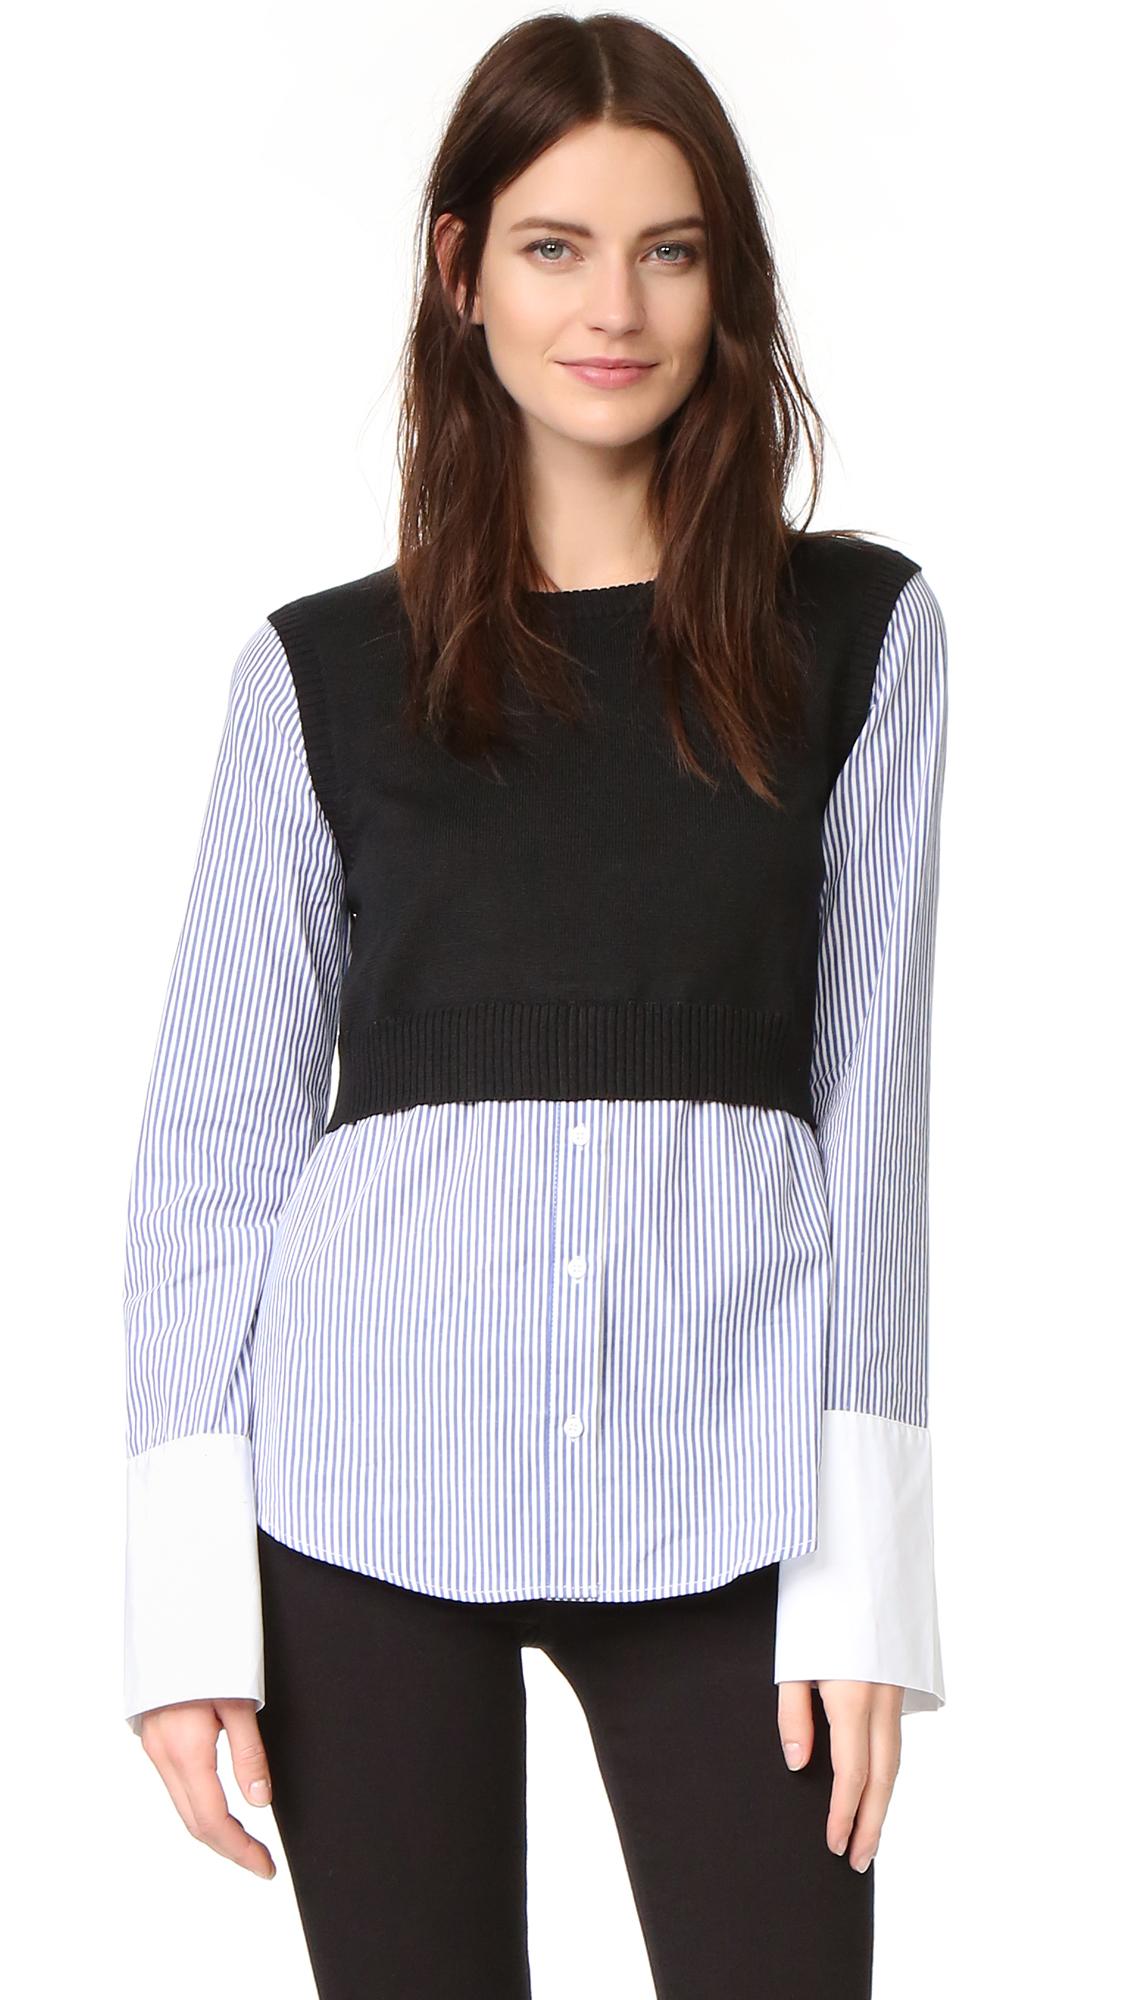 English Factory Combo Sweater - Blue Stripe/Black